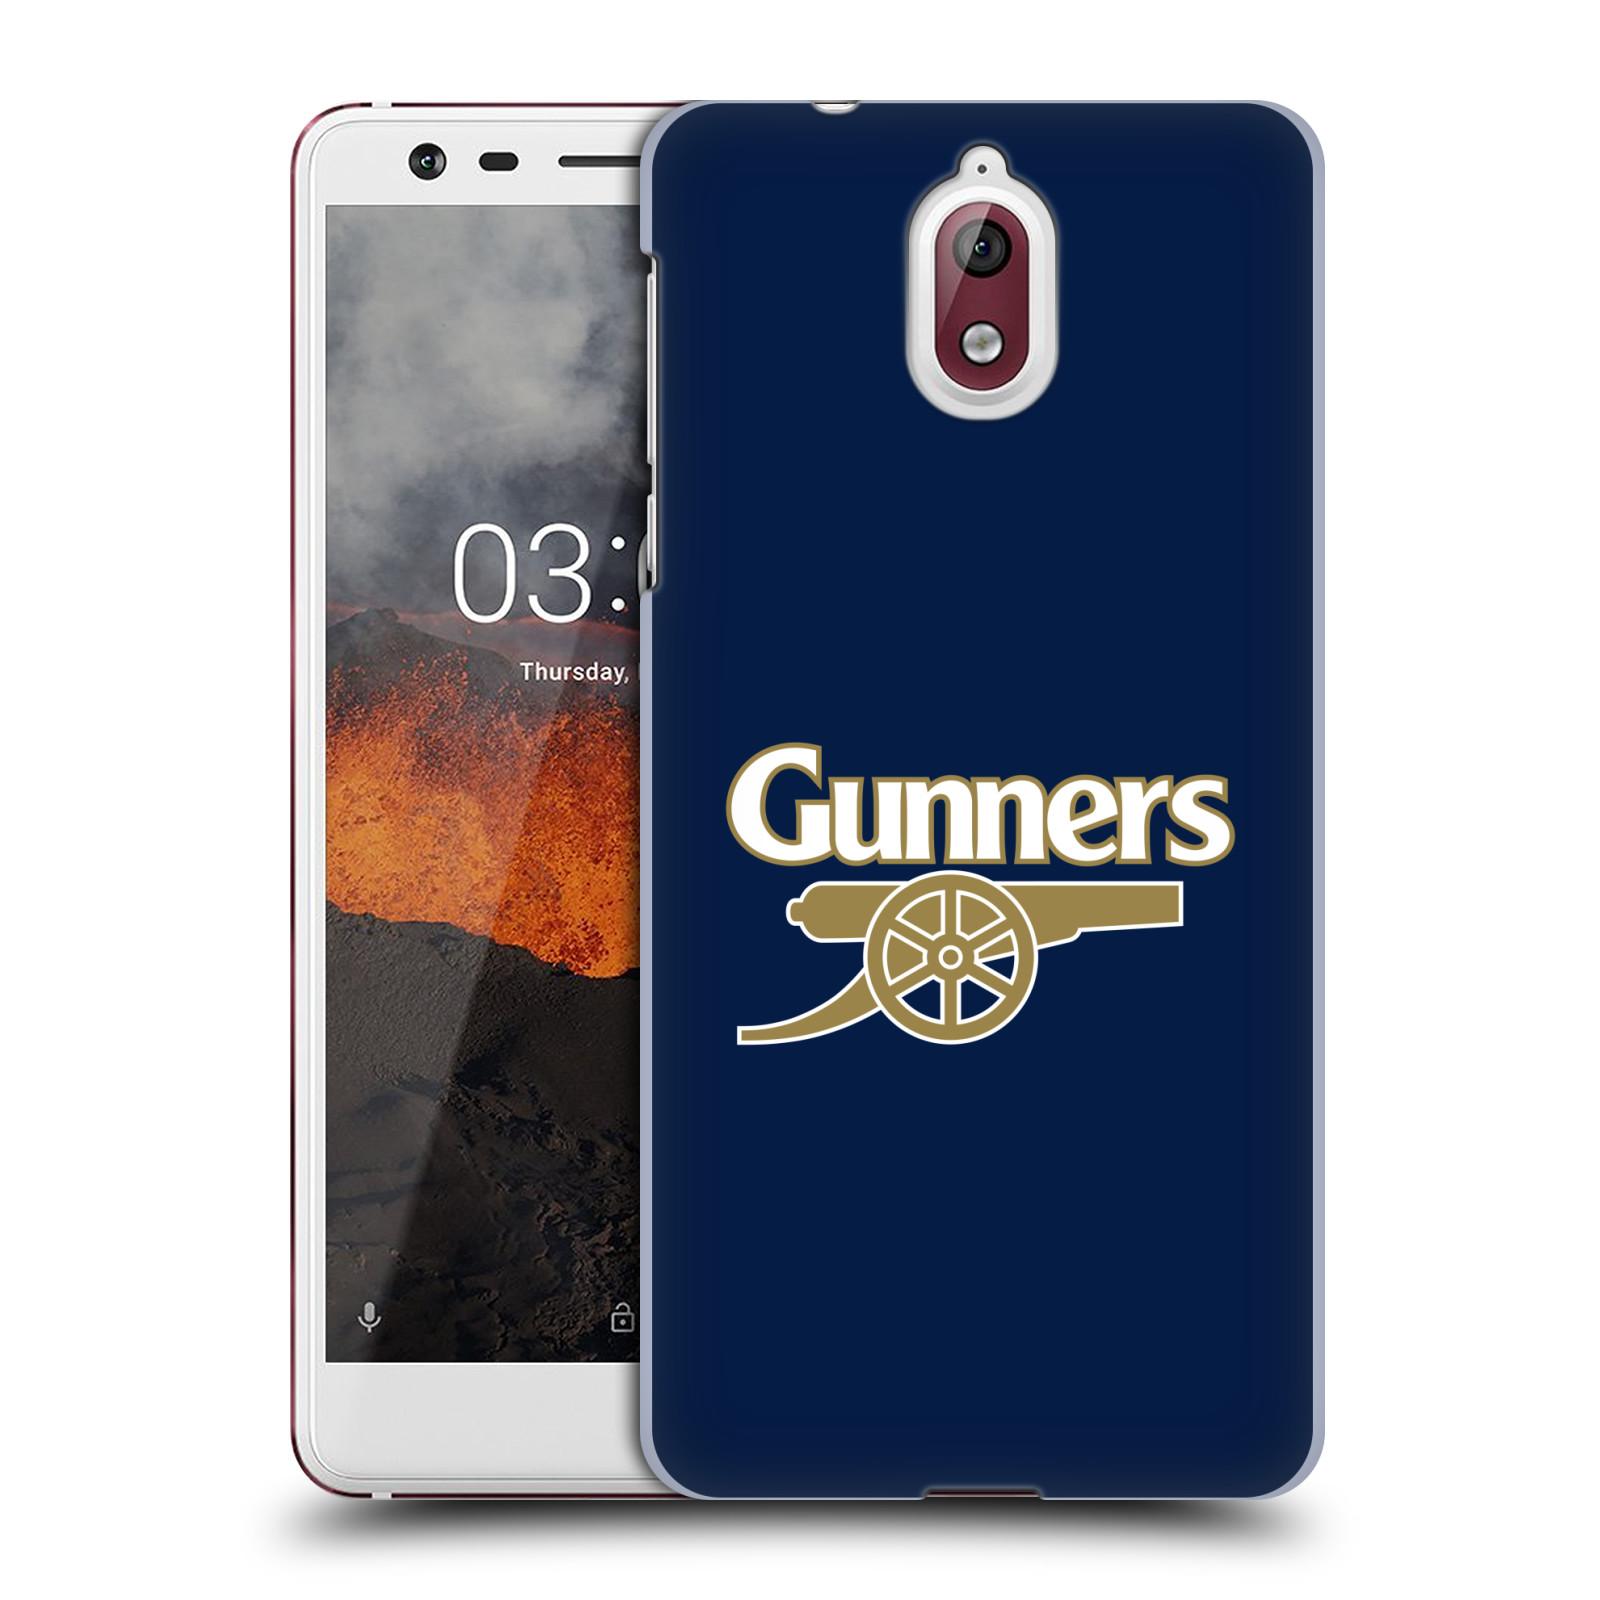 Plastové pouzdro na mobil Nokia 3.1 - Head Case - Arsenal FC - Gunners